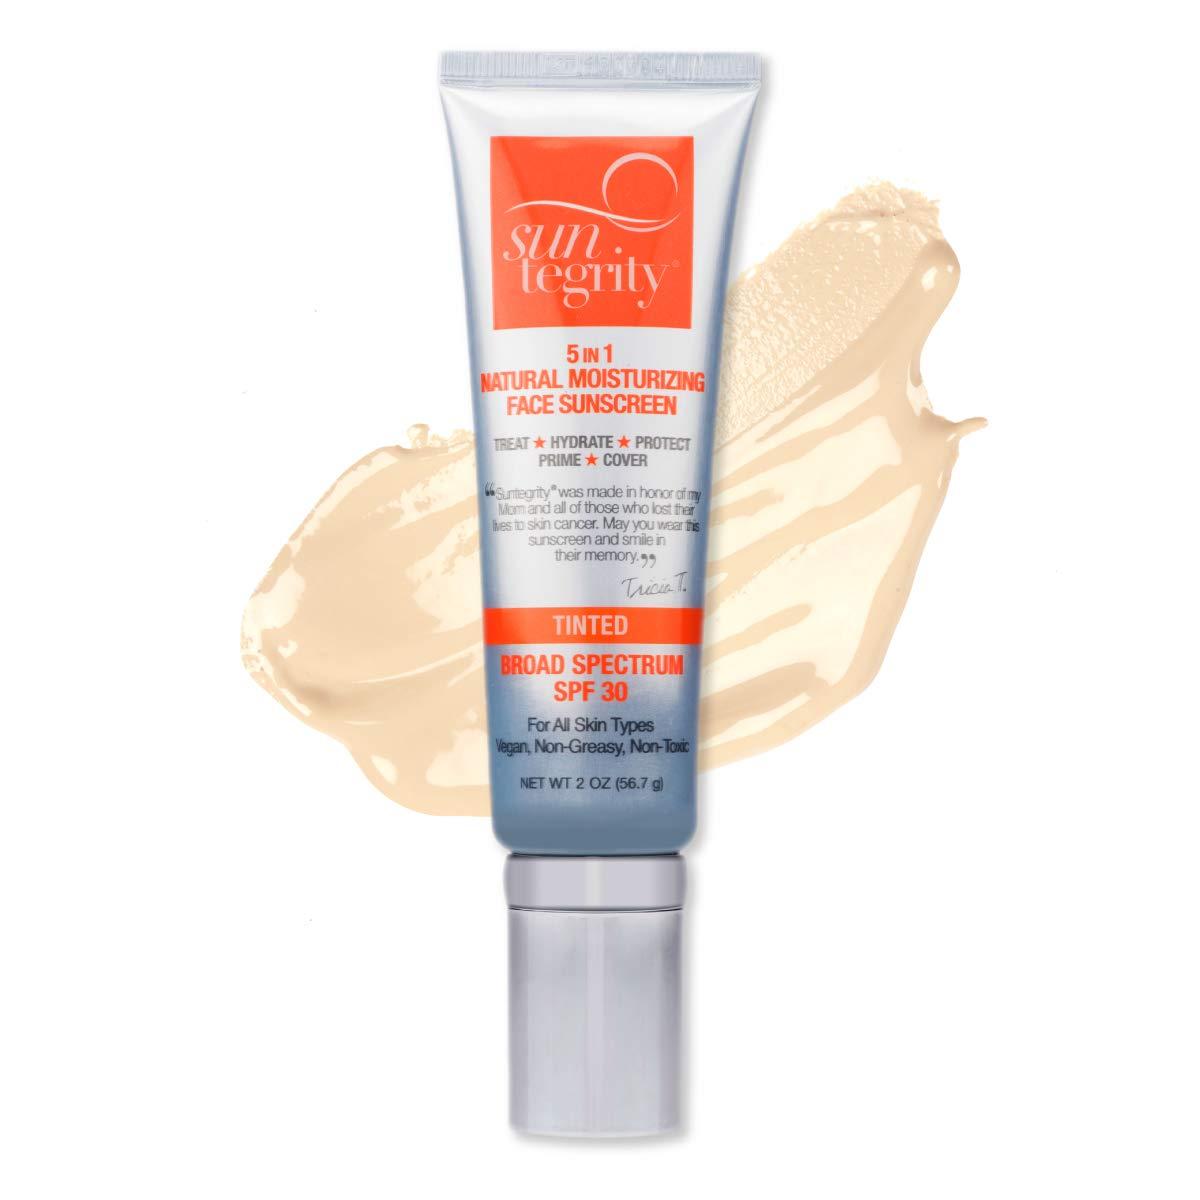 Suntegrity ''5 In 1'' Natural Moisturizing Face Sunscreen, Broad Spectrum Spf 30 - FAIR